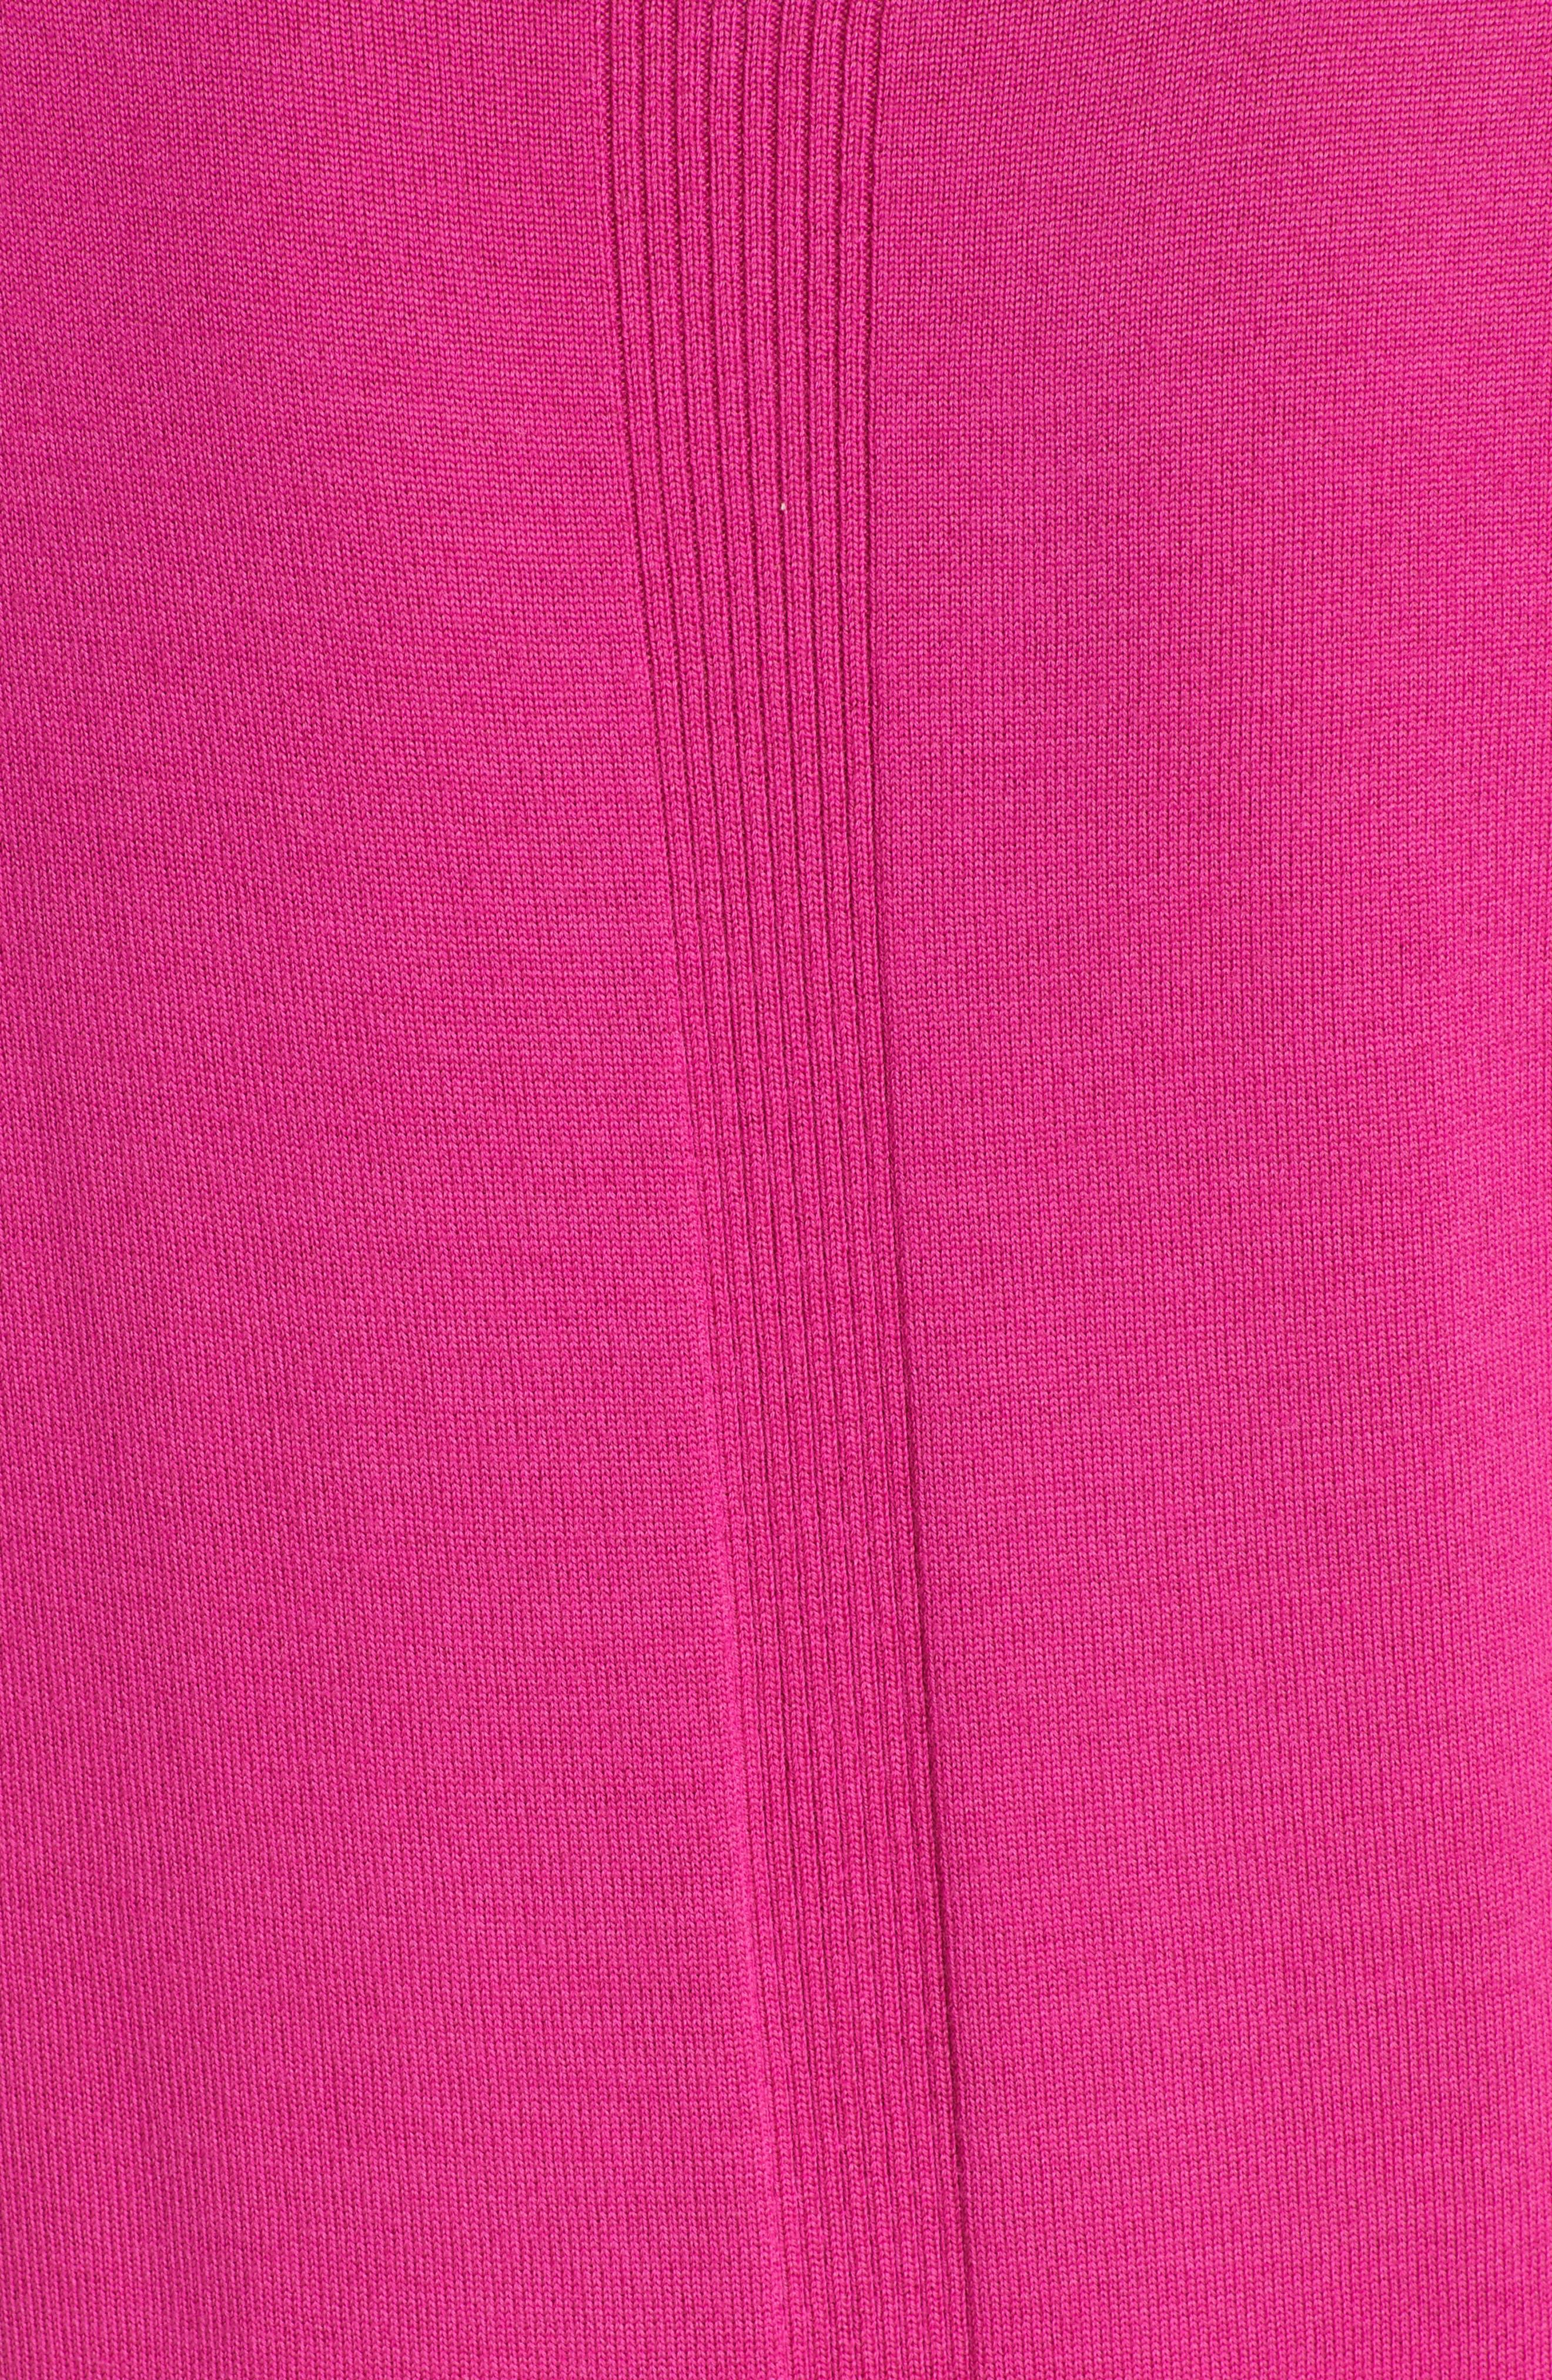 Jersey & Silk Shell,                             Alternate thumbnail 5, color,                             CAMELLIA